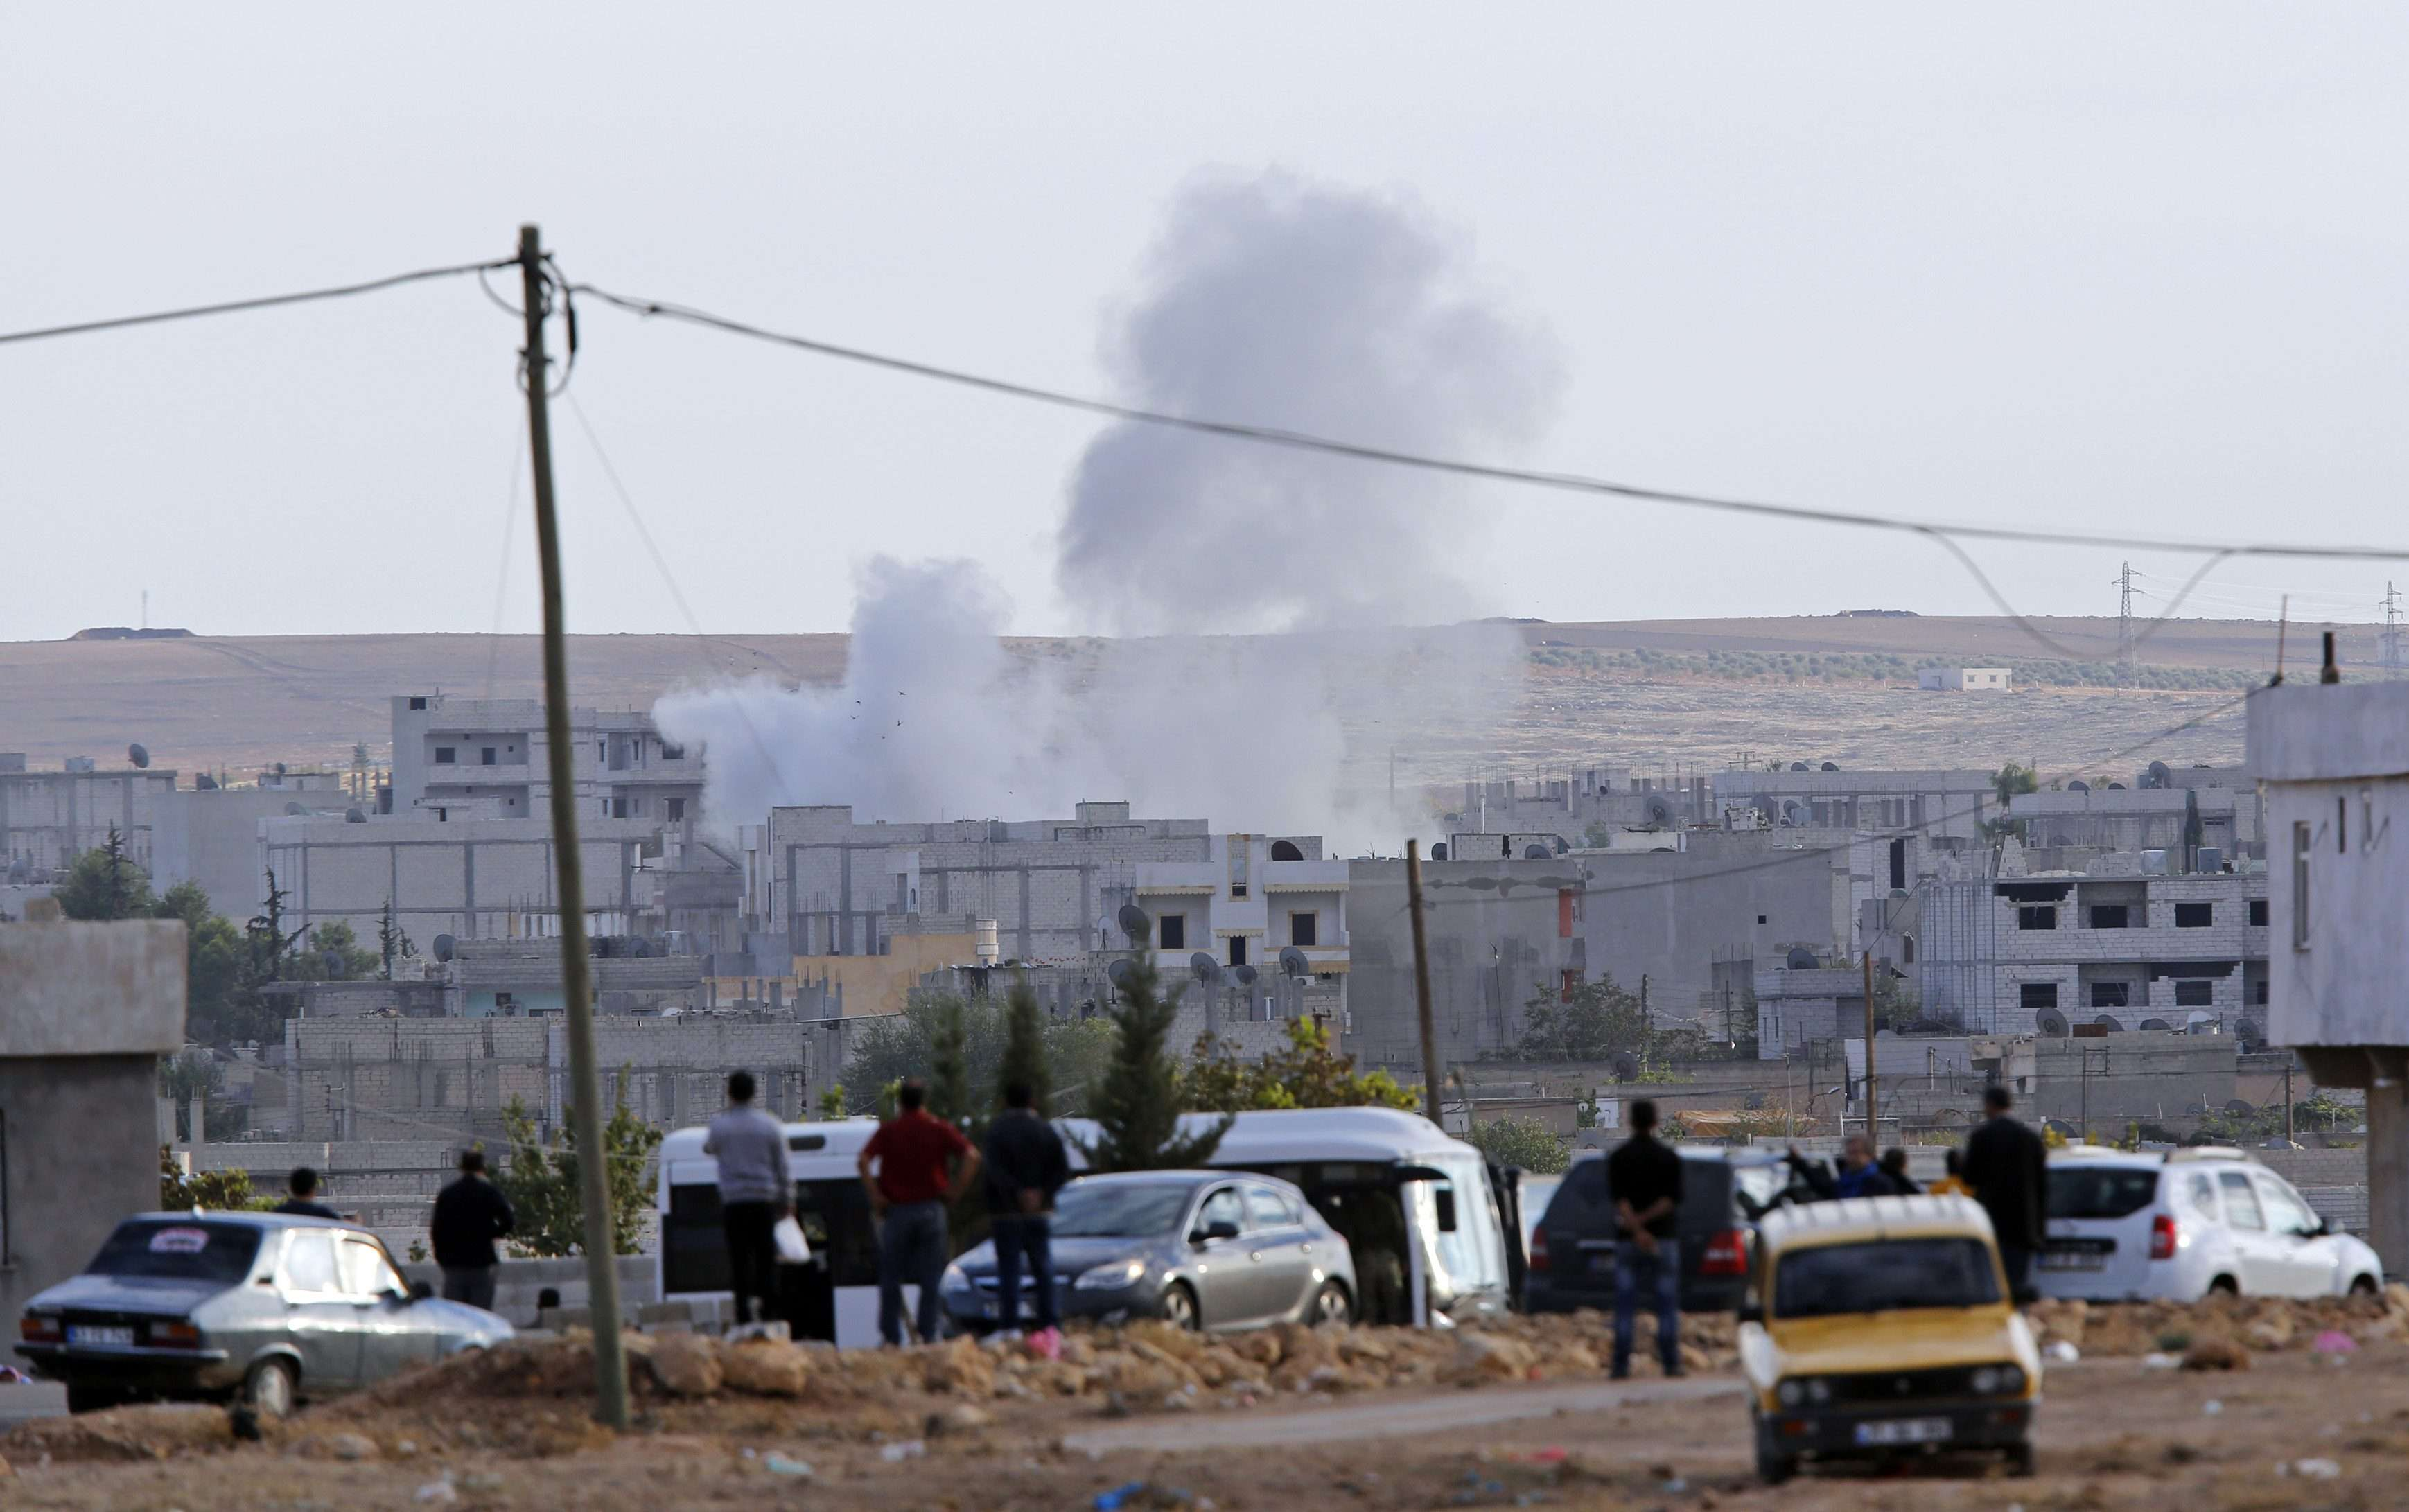 A cidade de Kobani apresenta alguns grupos de resistência aos ataques dos jihadistas Foto: Murad Sezer/Reuters